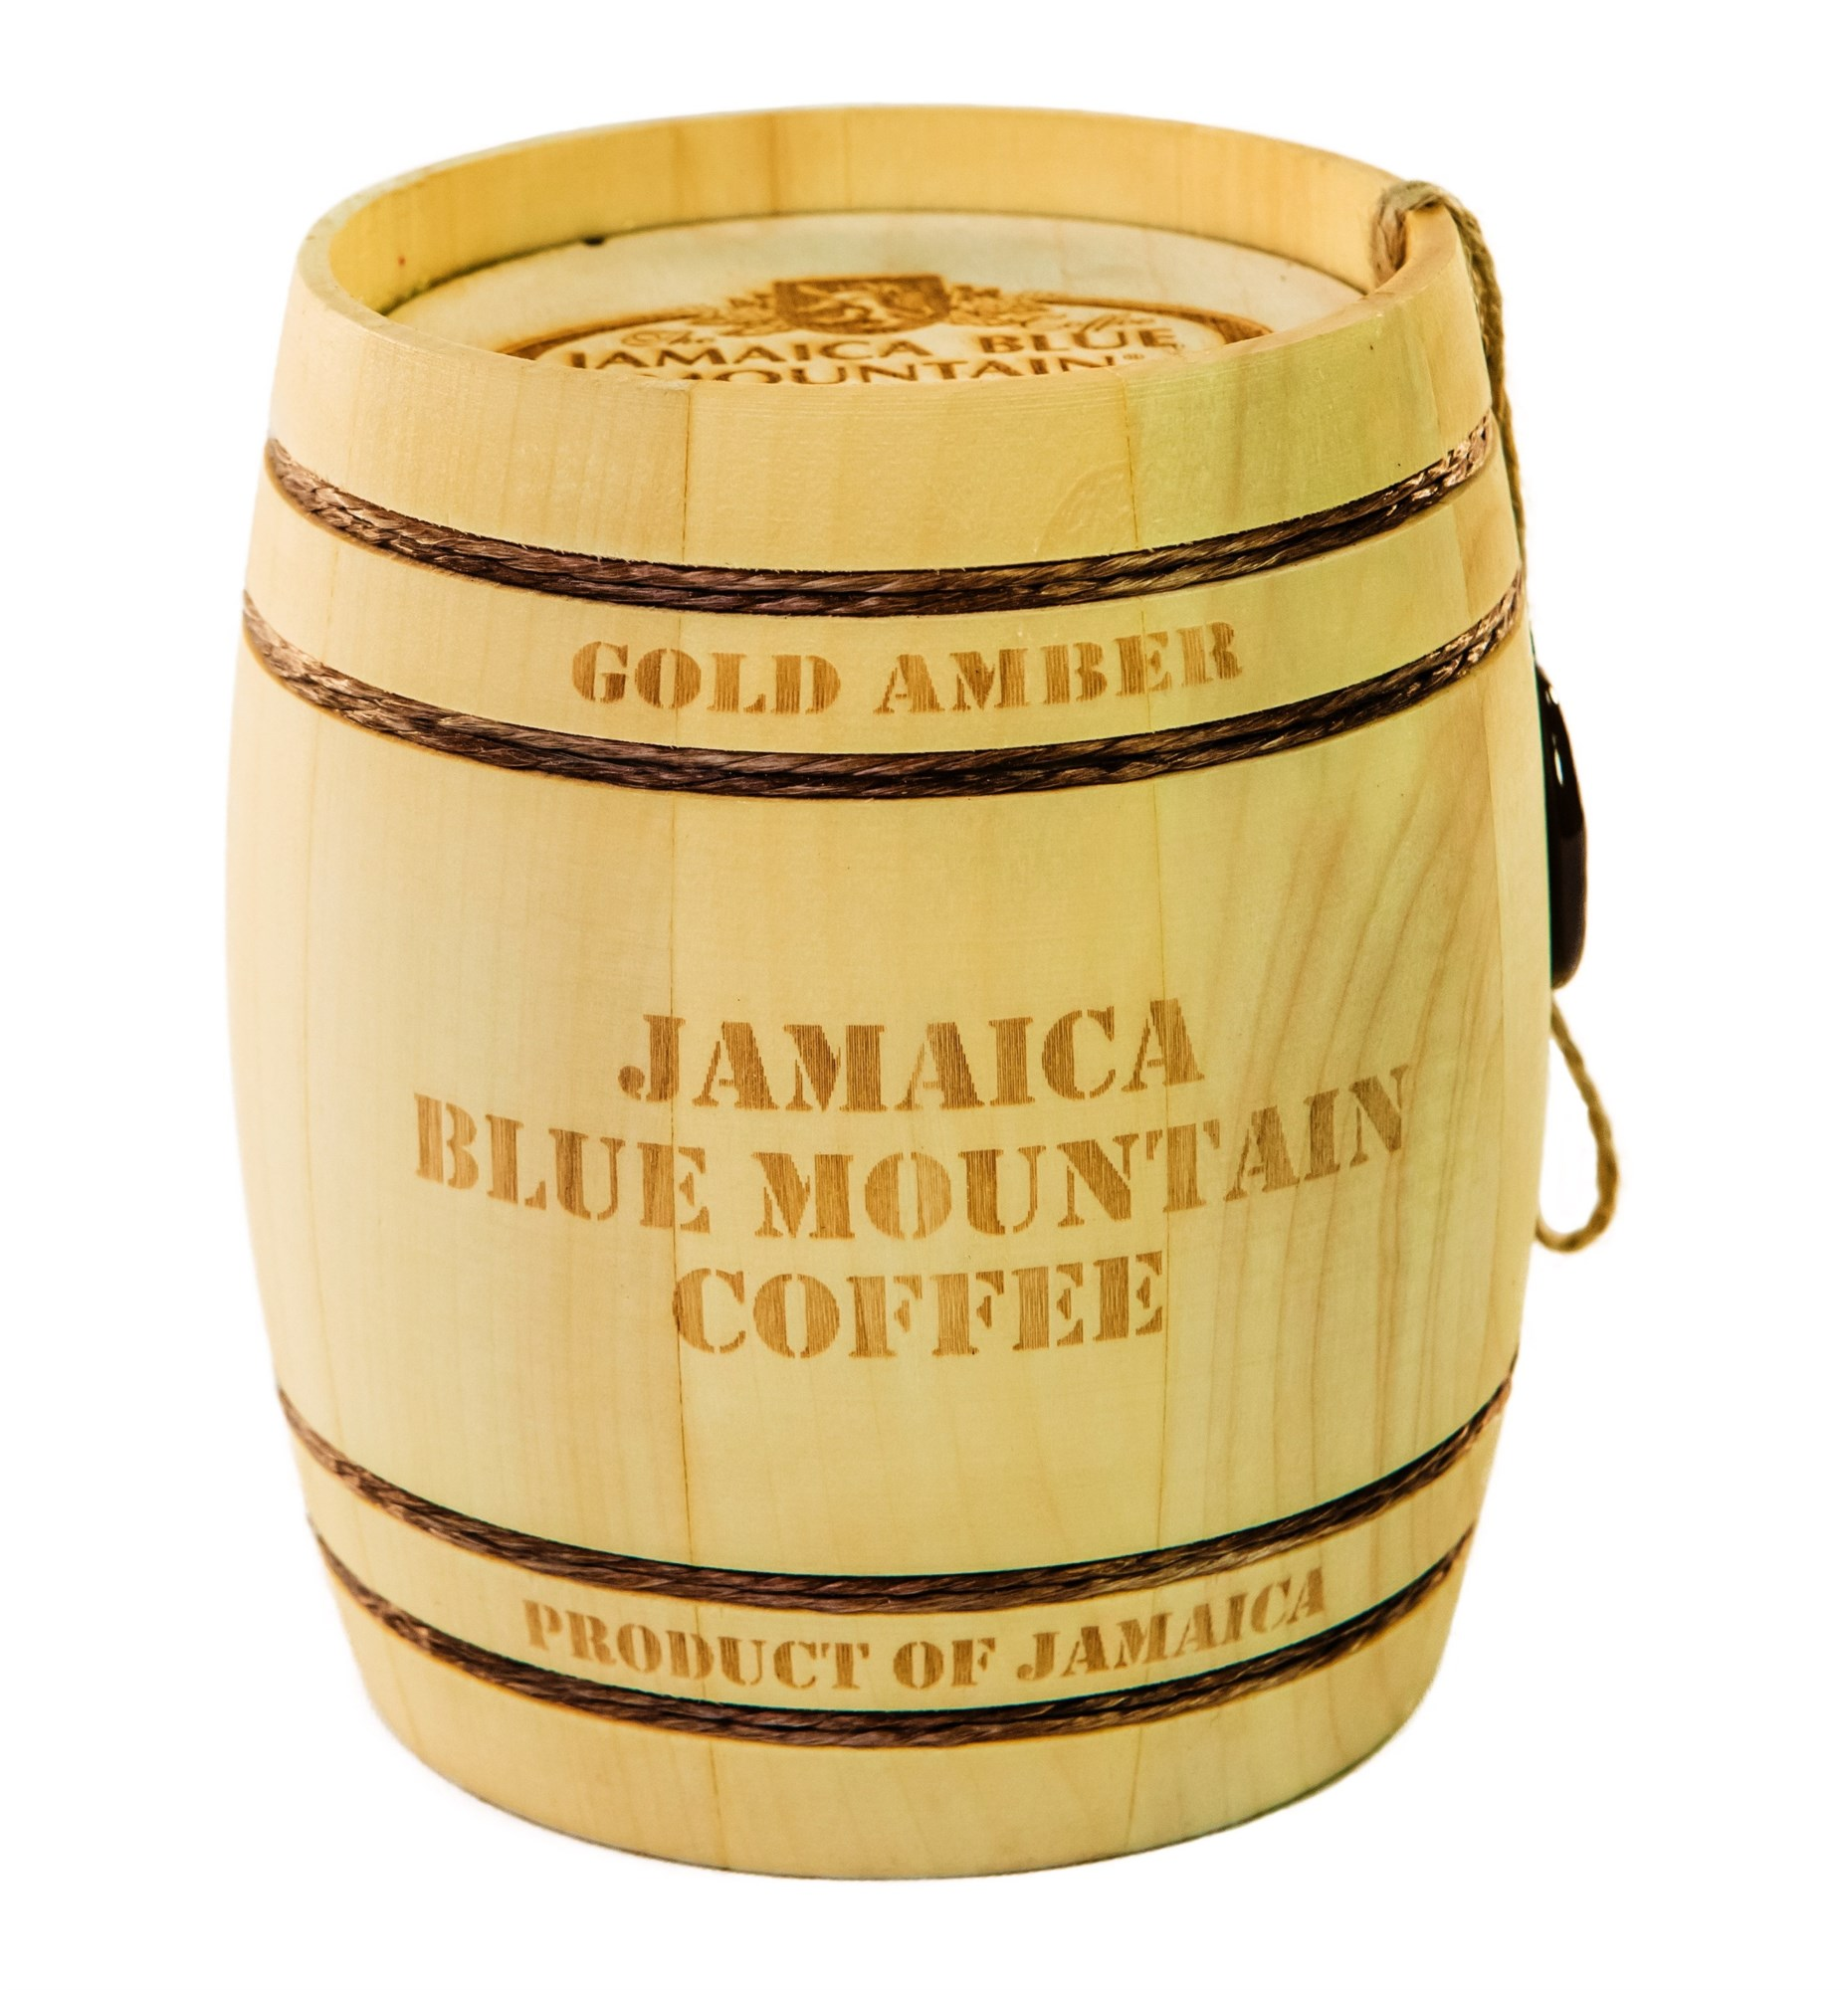 Кофе Ямайка Блю Маунтин Gold Amber, зерно, обжарка средняя, бочонок (150 г)